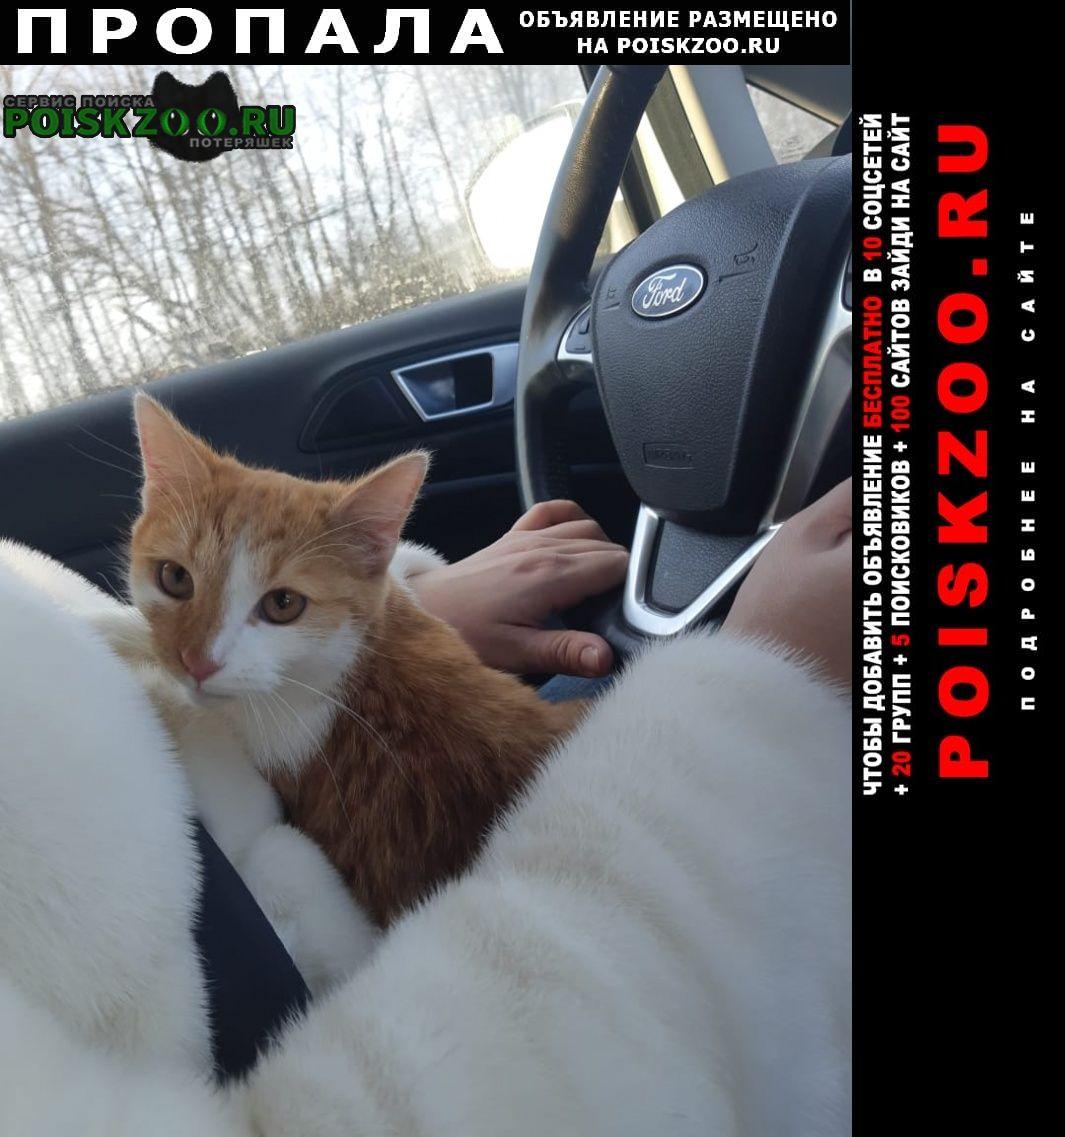 Пропала кошка Липецк